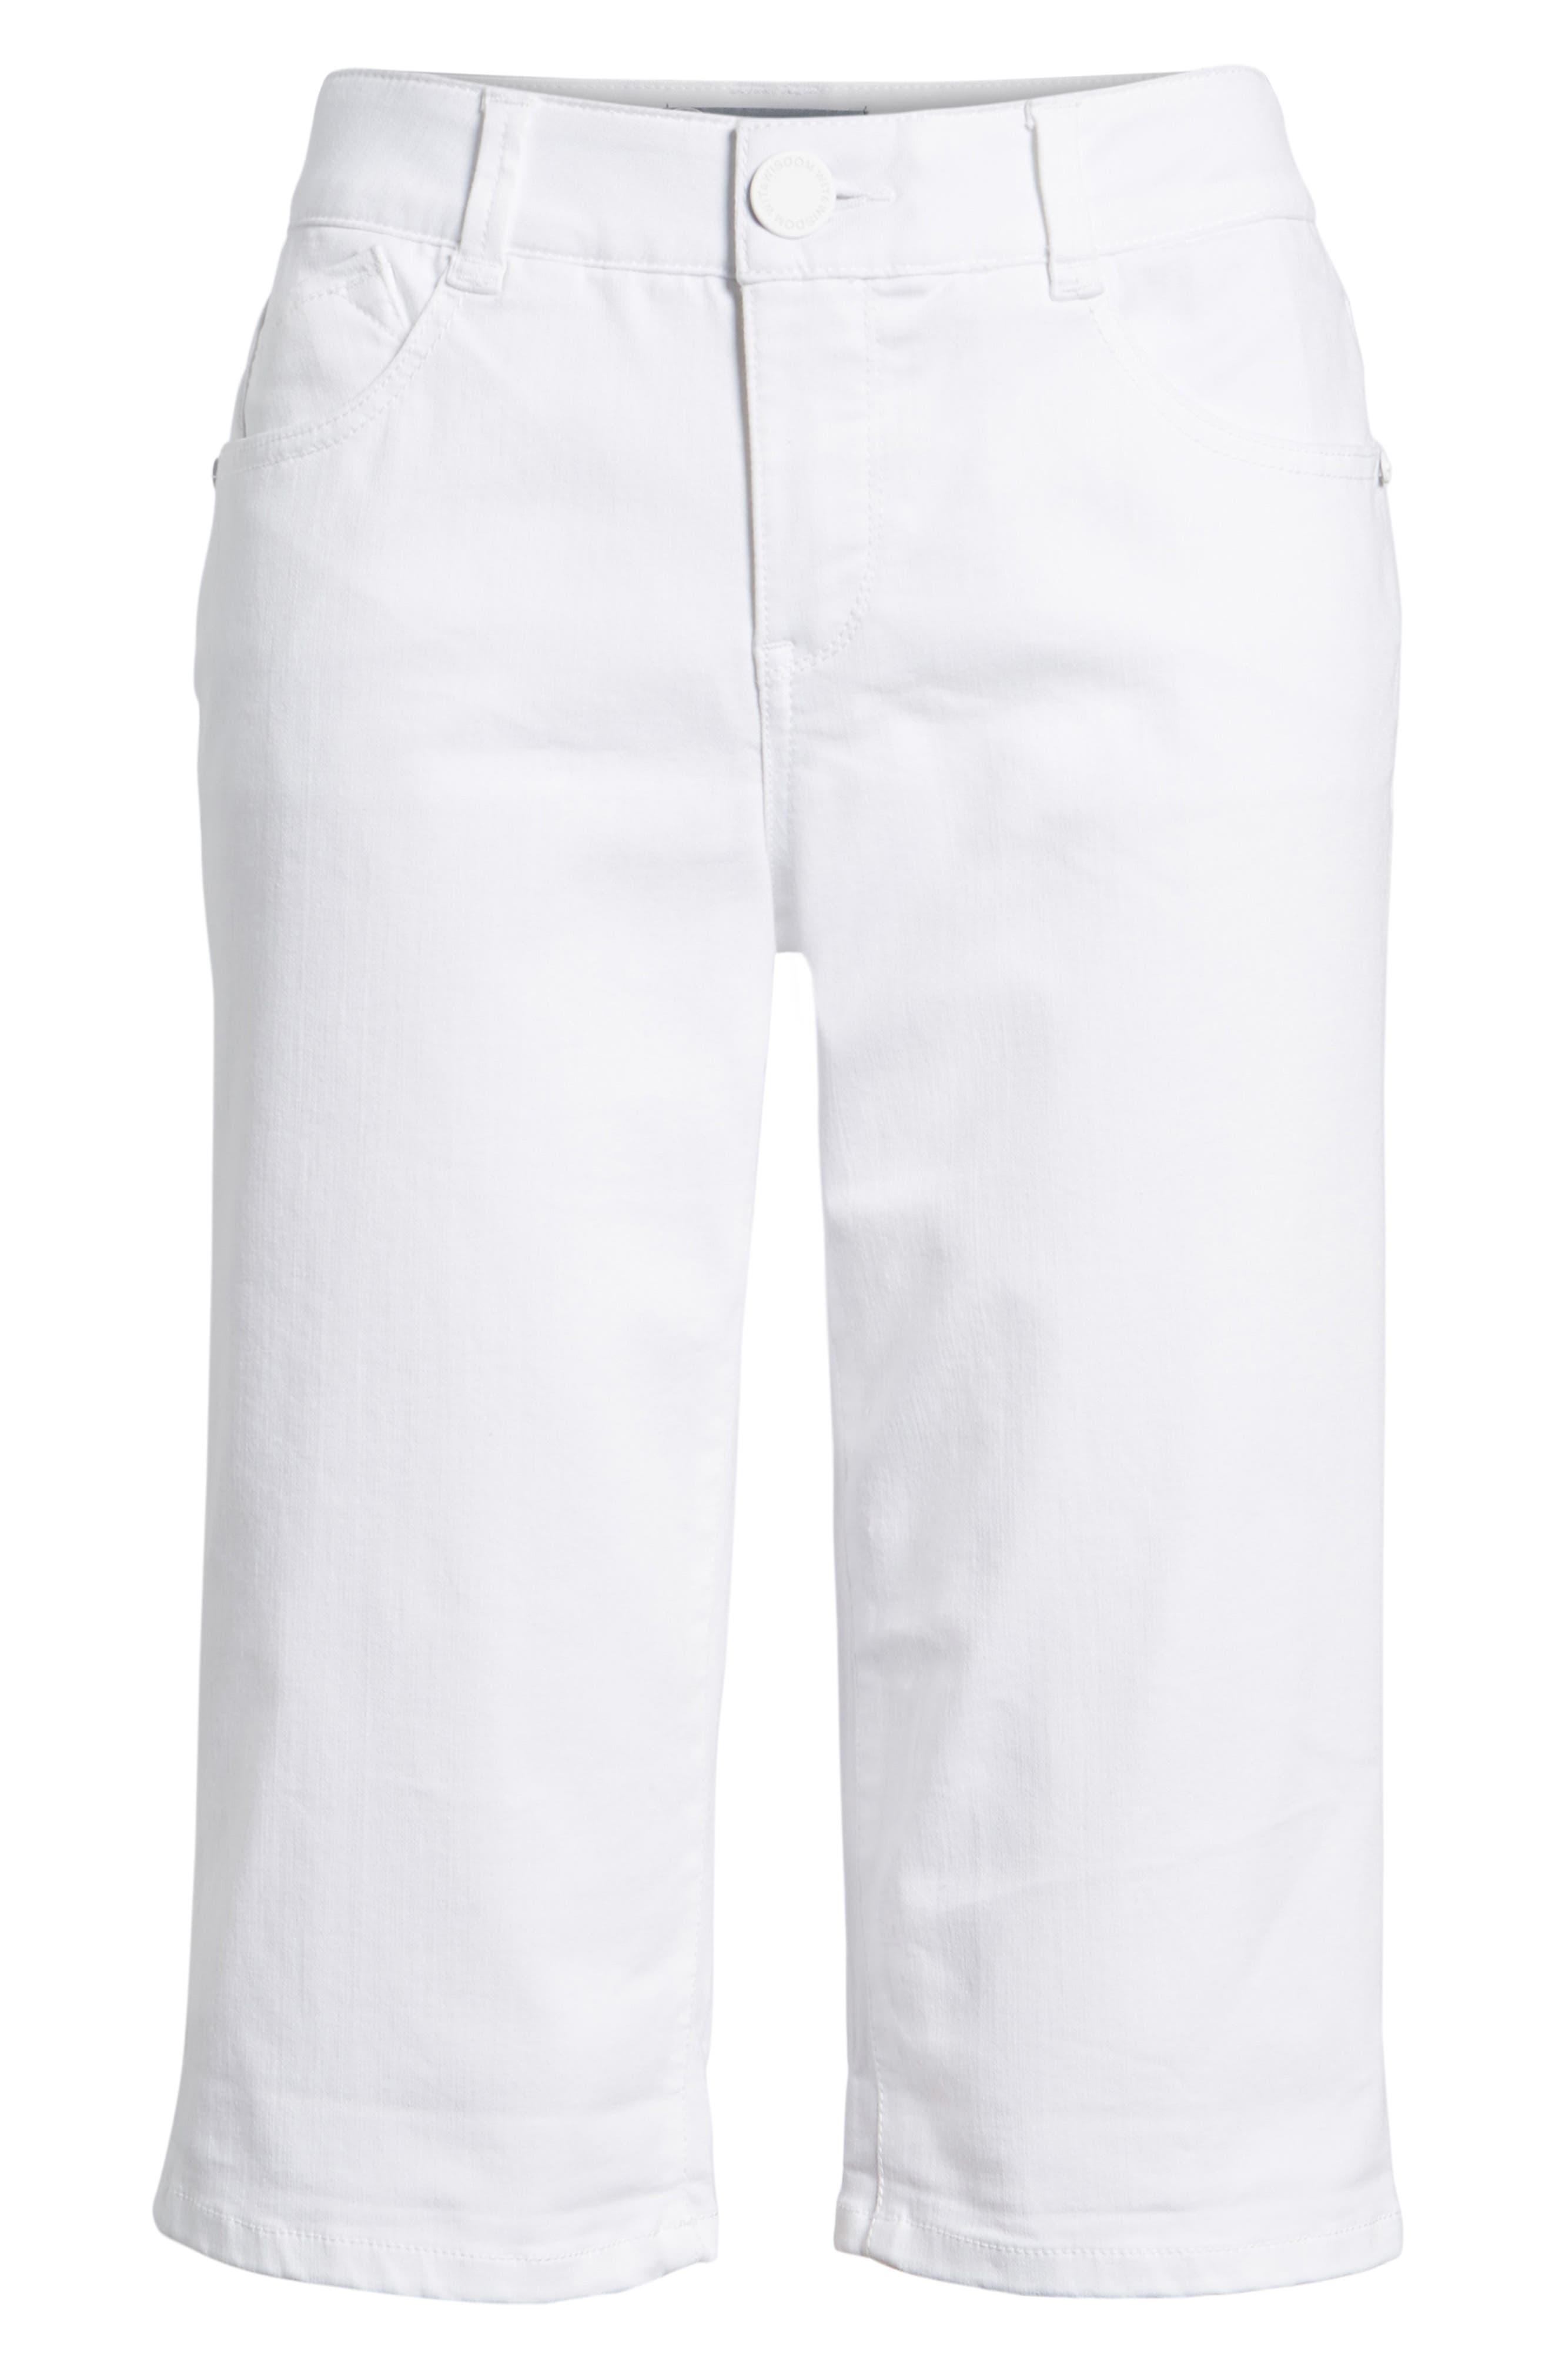 Ab-solution White Bermuda Shorts,                             Alternate thumbnail 7, color,                             106